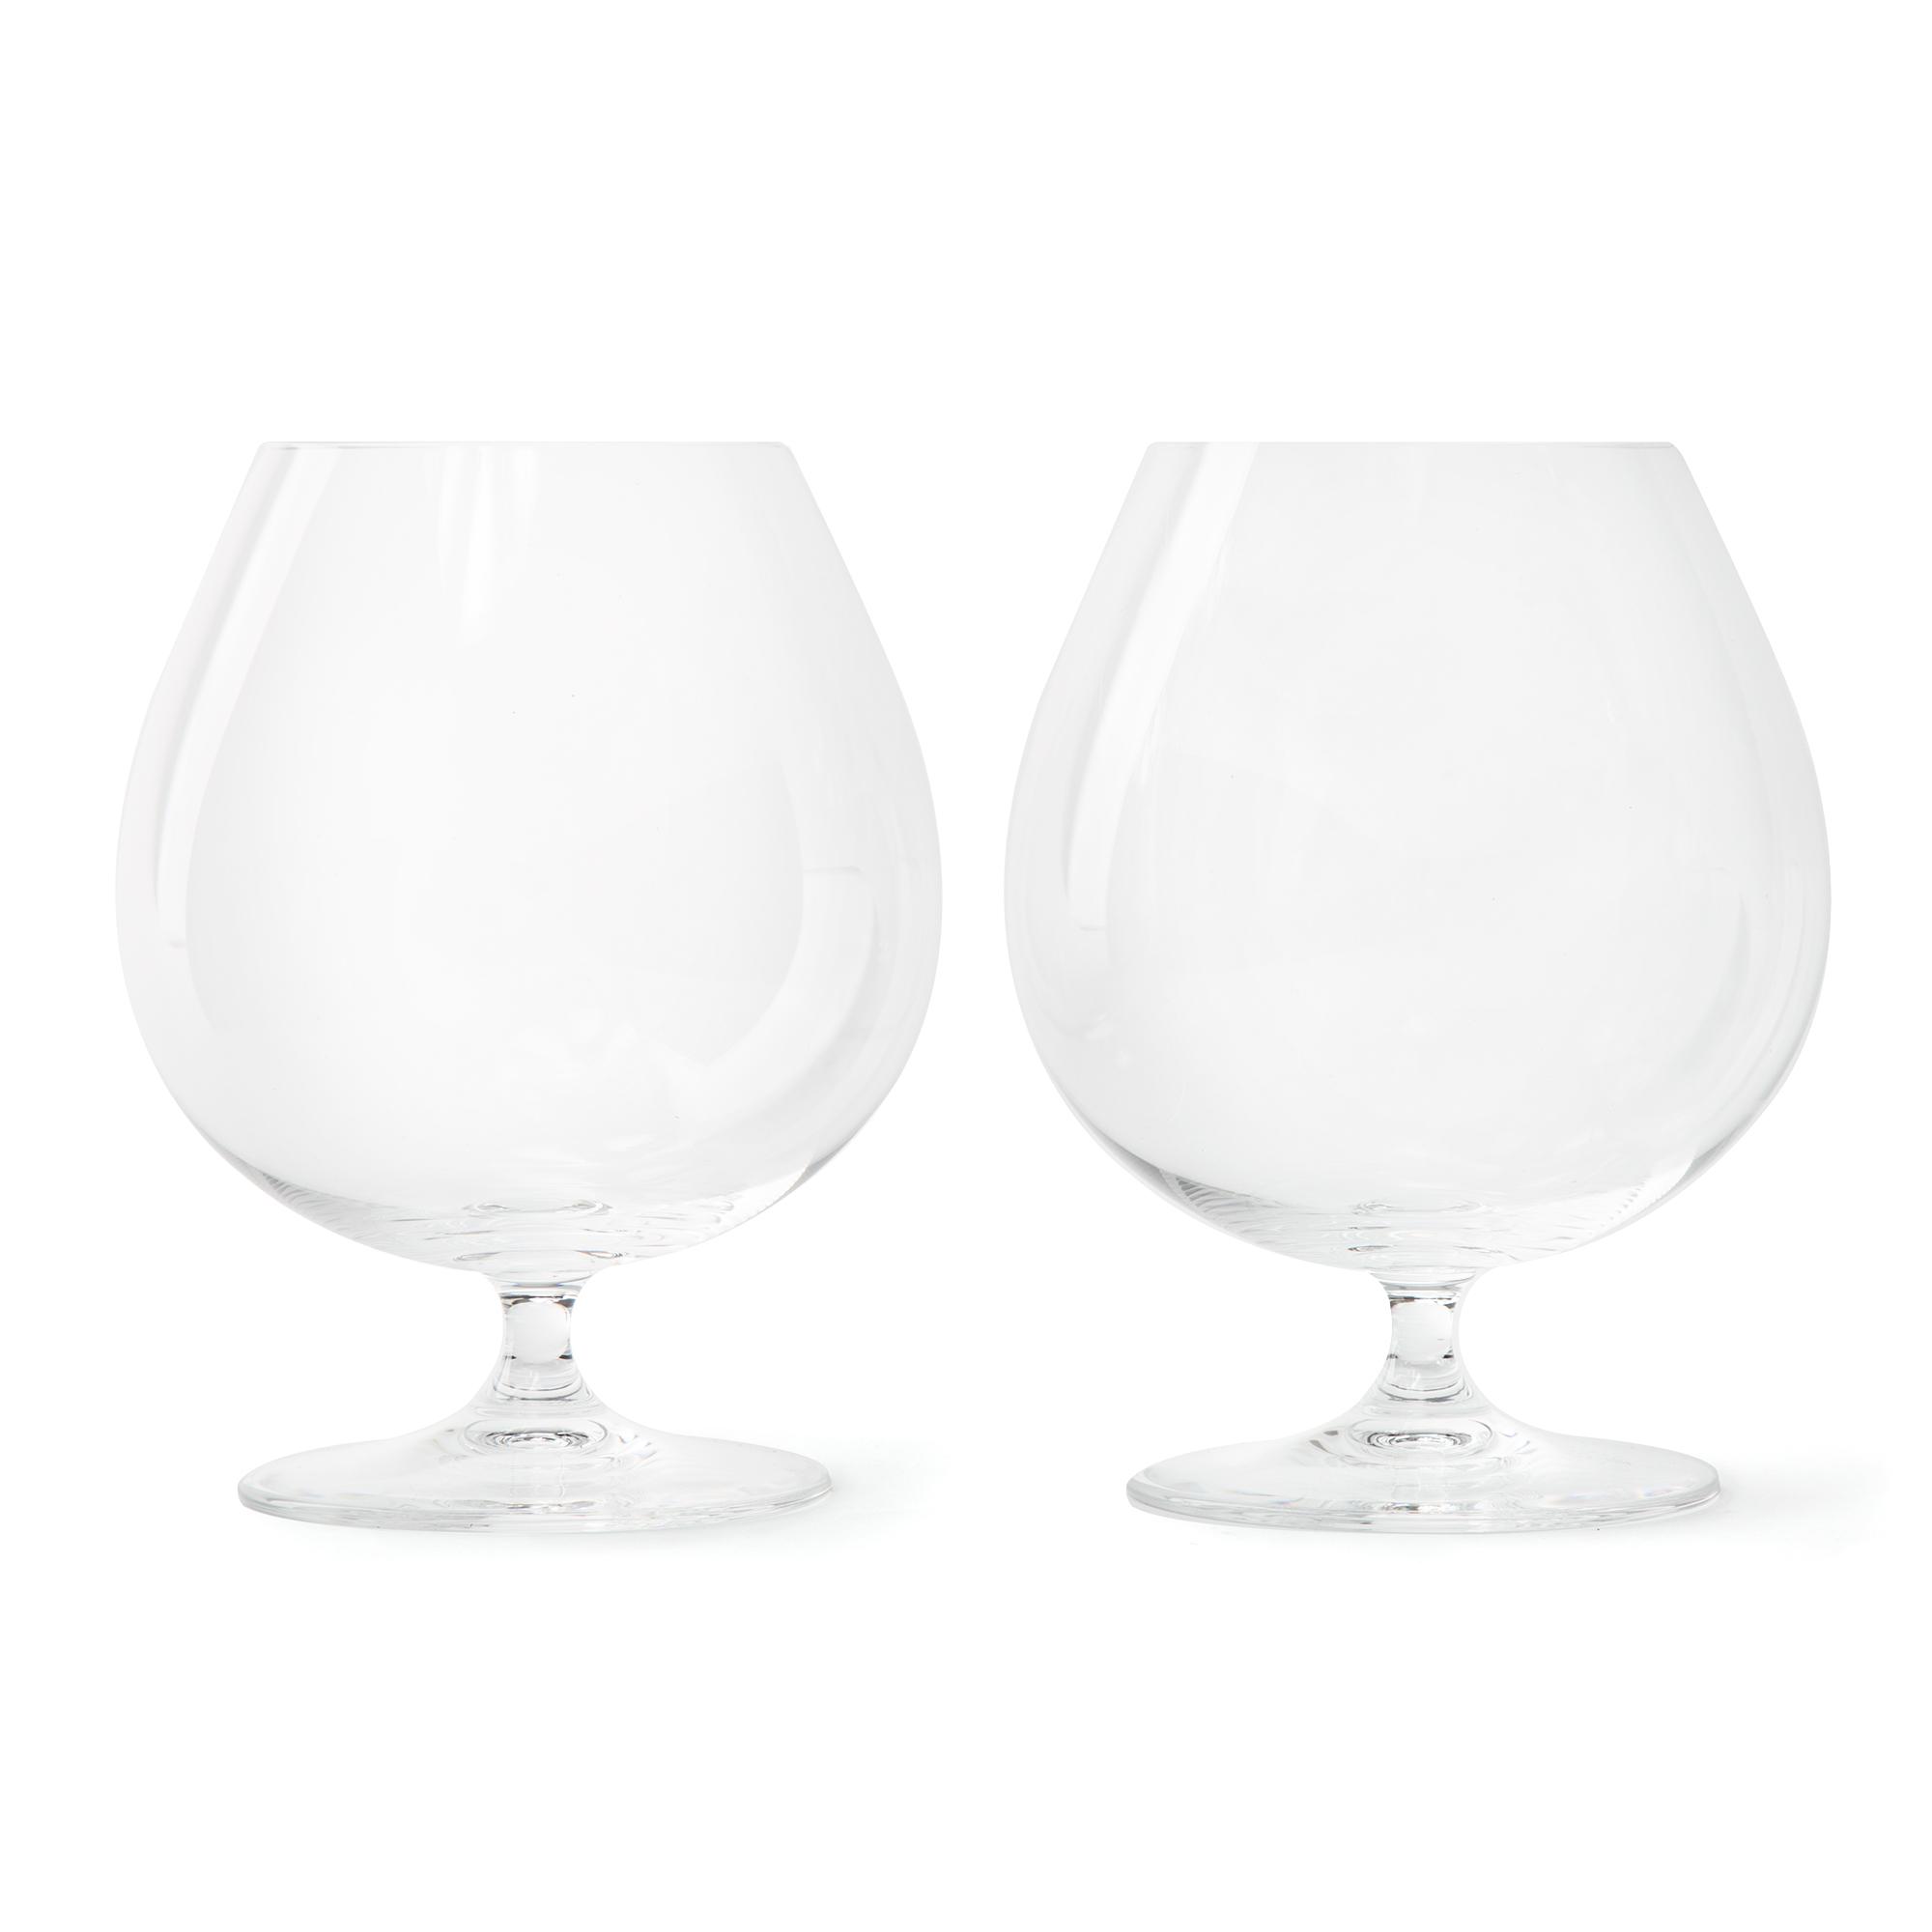 Riedel Tail Gles Best Cnapracticetesting 2018 Martini Vinum